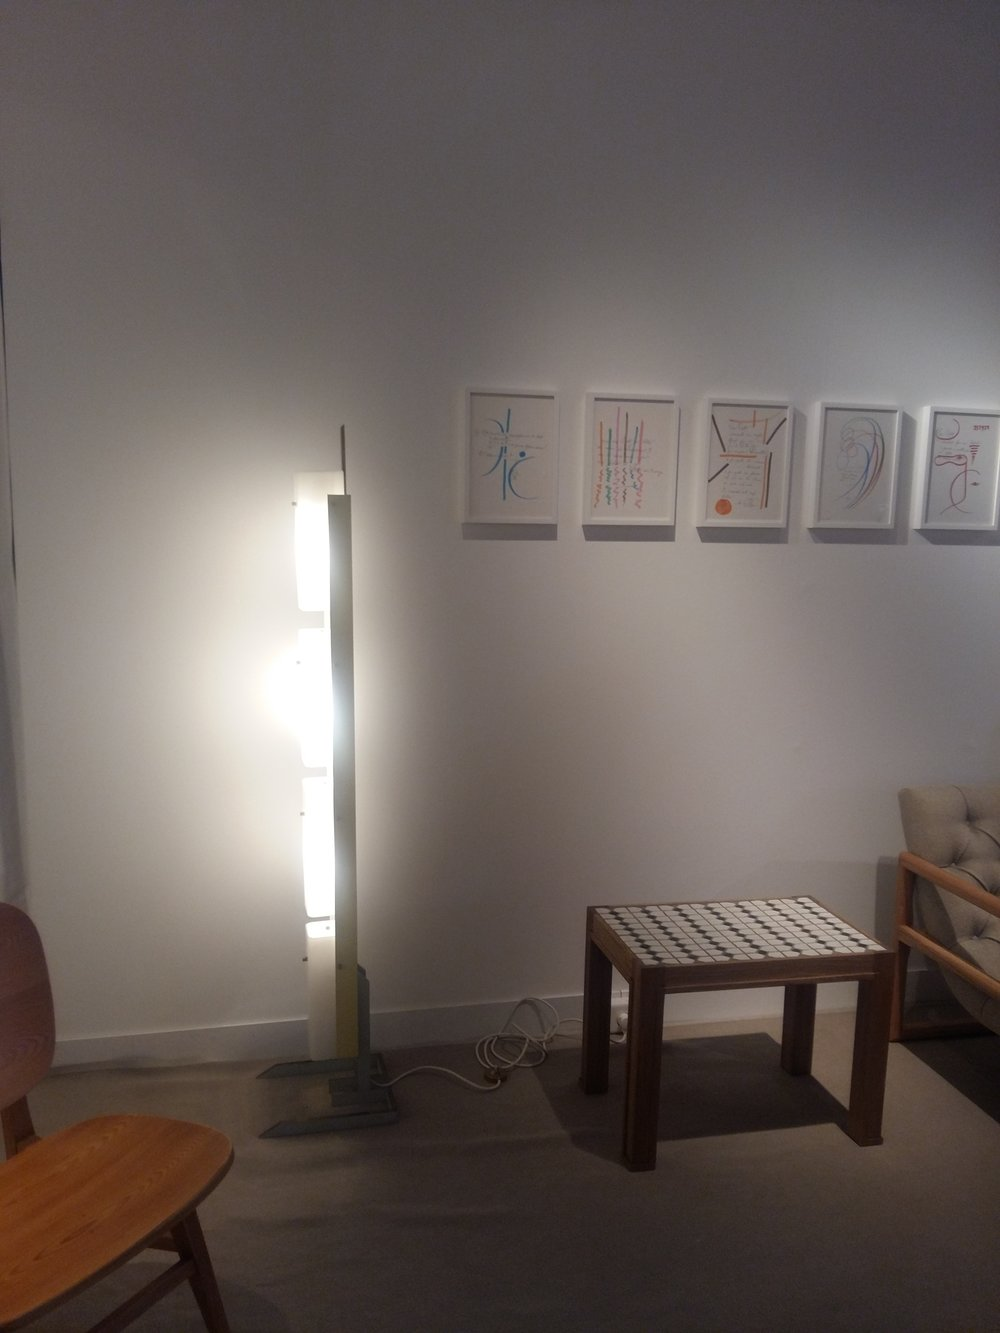 Stand de la galerie Eric Phillipe - Dessins de Gio Ponti.jpg